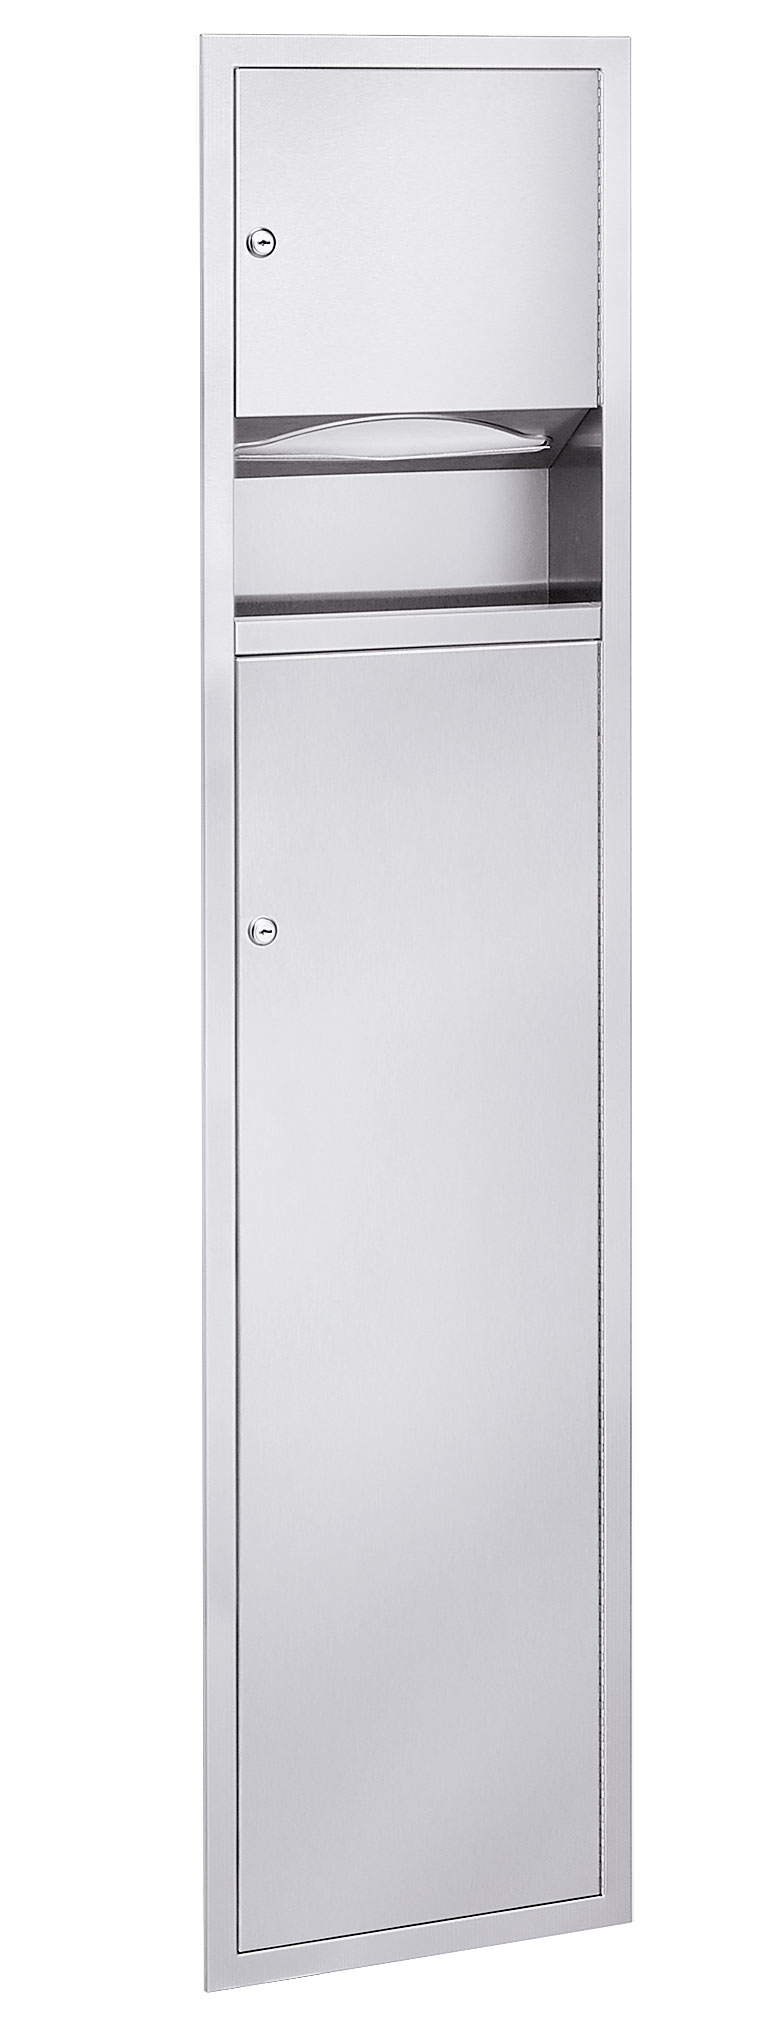 Low Capacity Towel Dispenser    5 3 Gallon Waste Receptacle